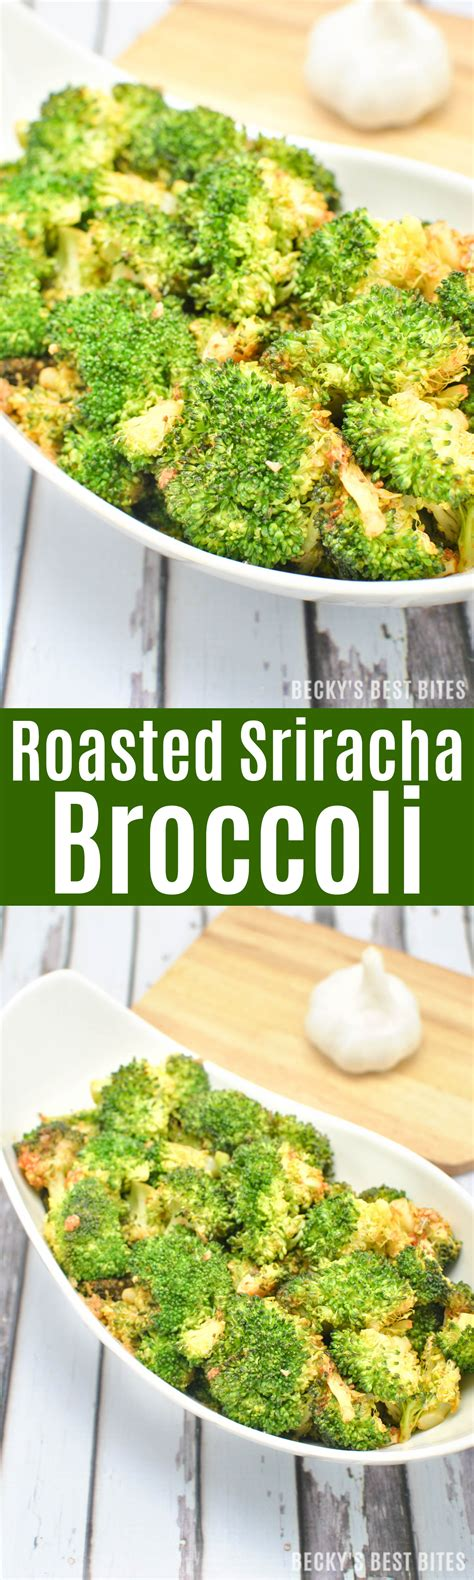 rachael roasted broccoli roasted broccoli